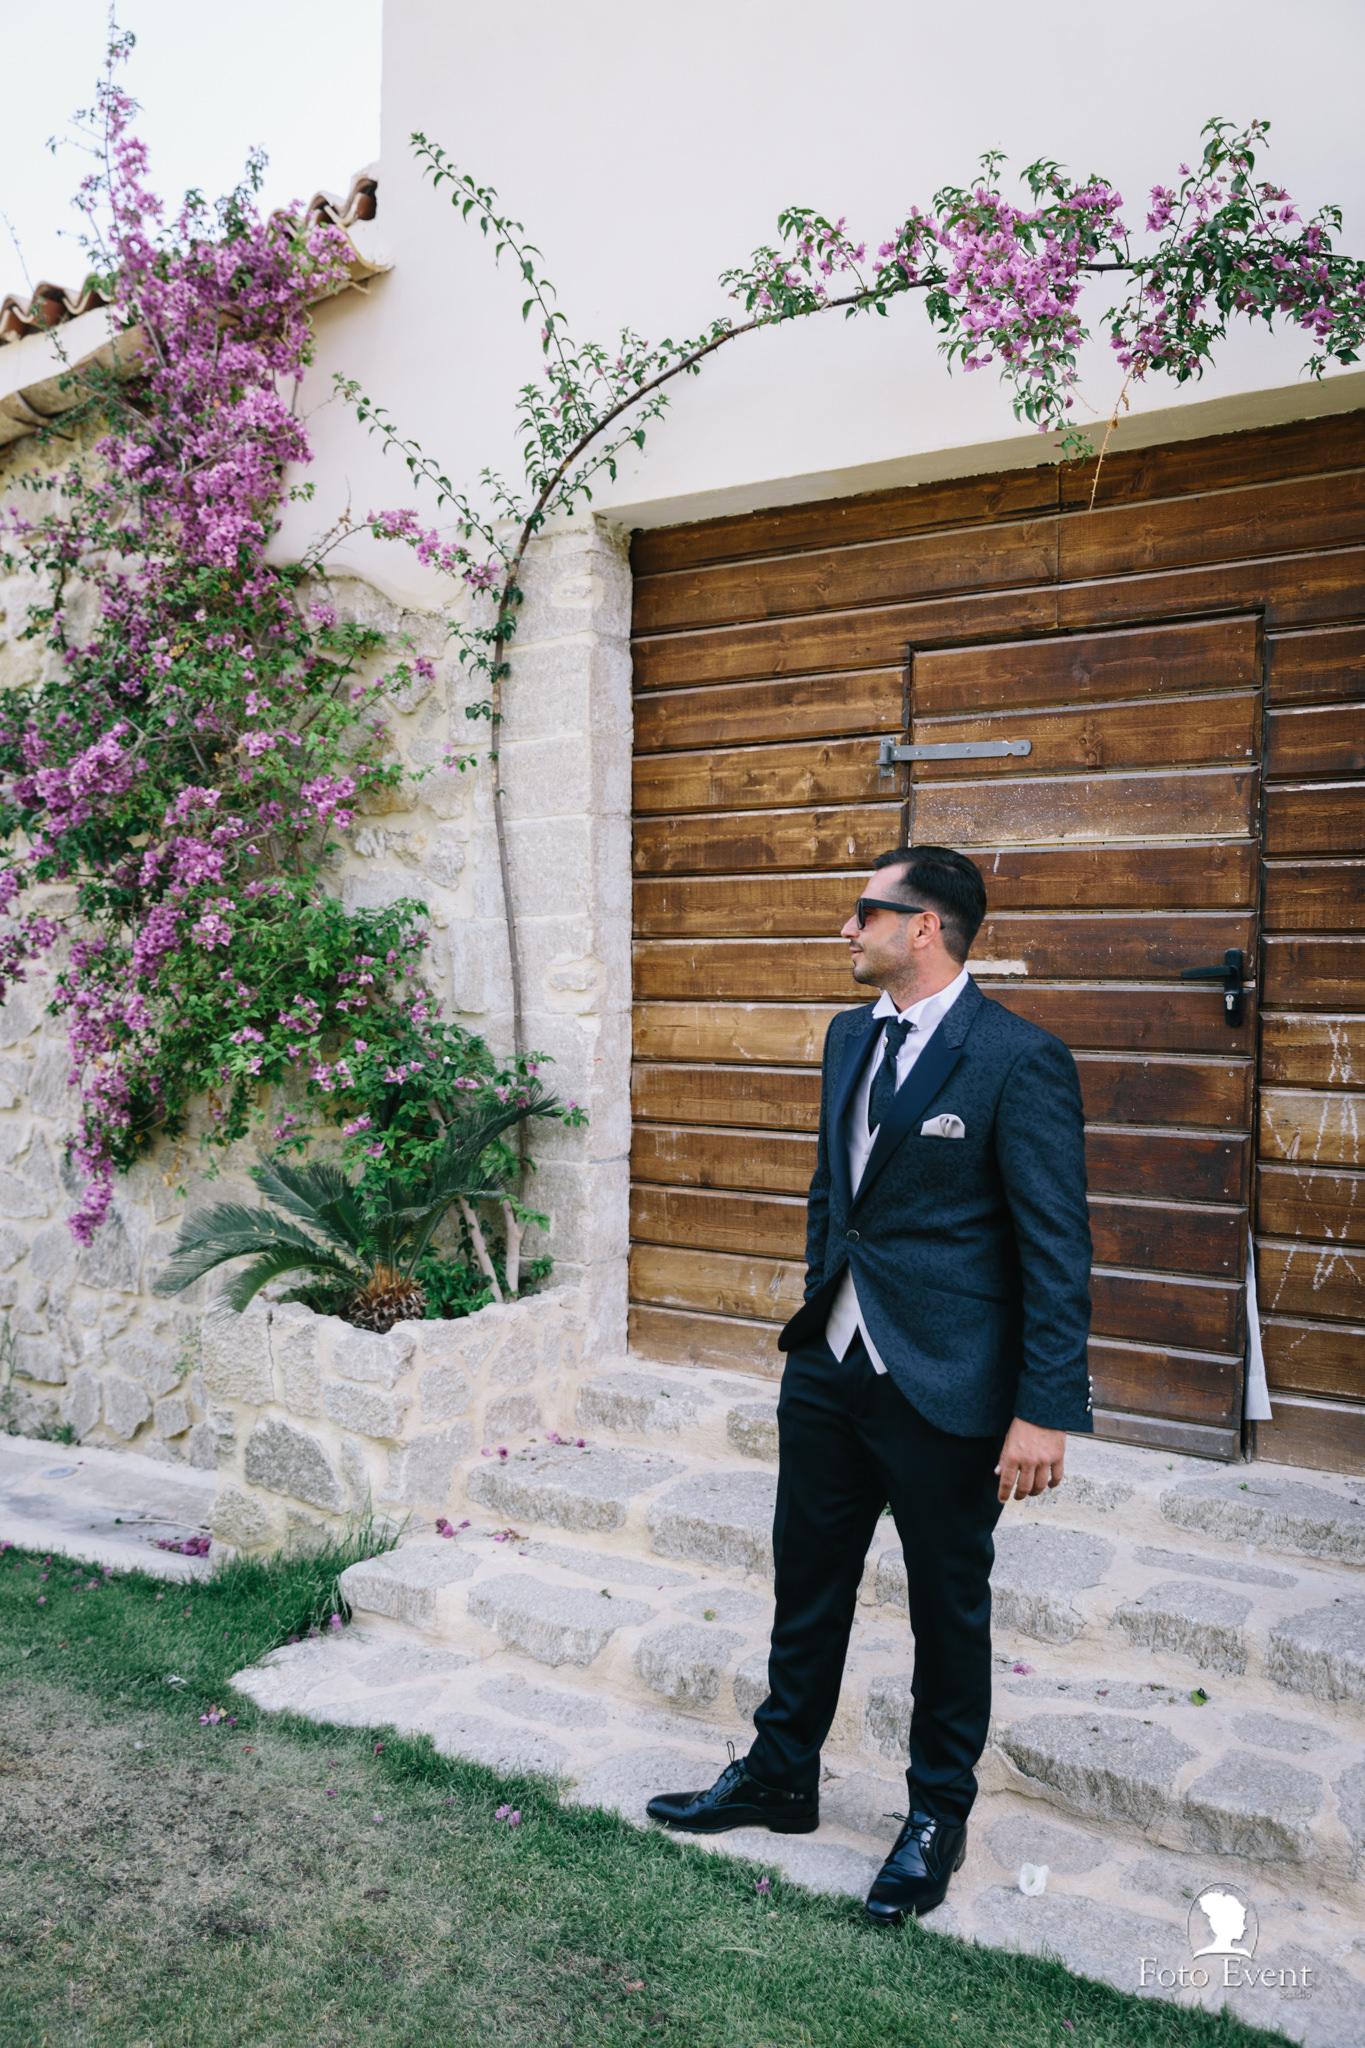 018-2019-06-12-Matrimonio-Rosa-e-Angelo-Ripellino-5DE-824